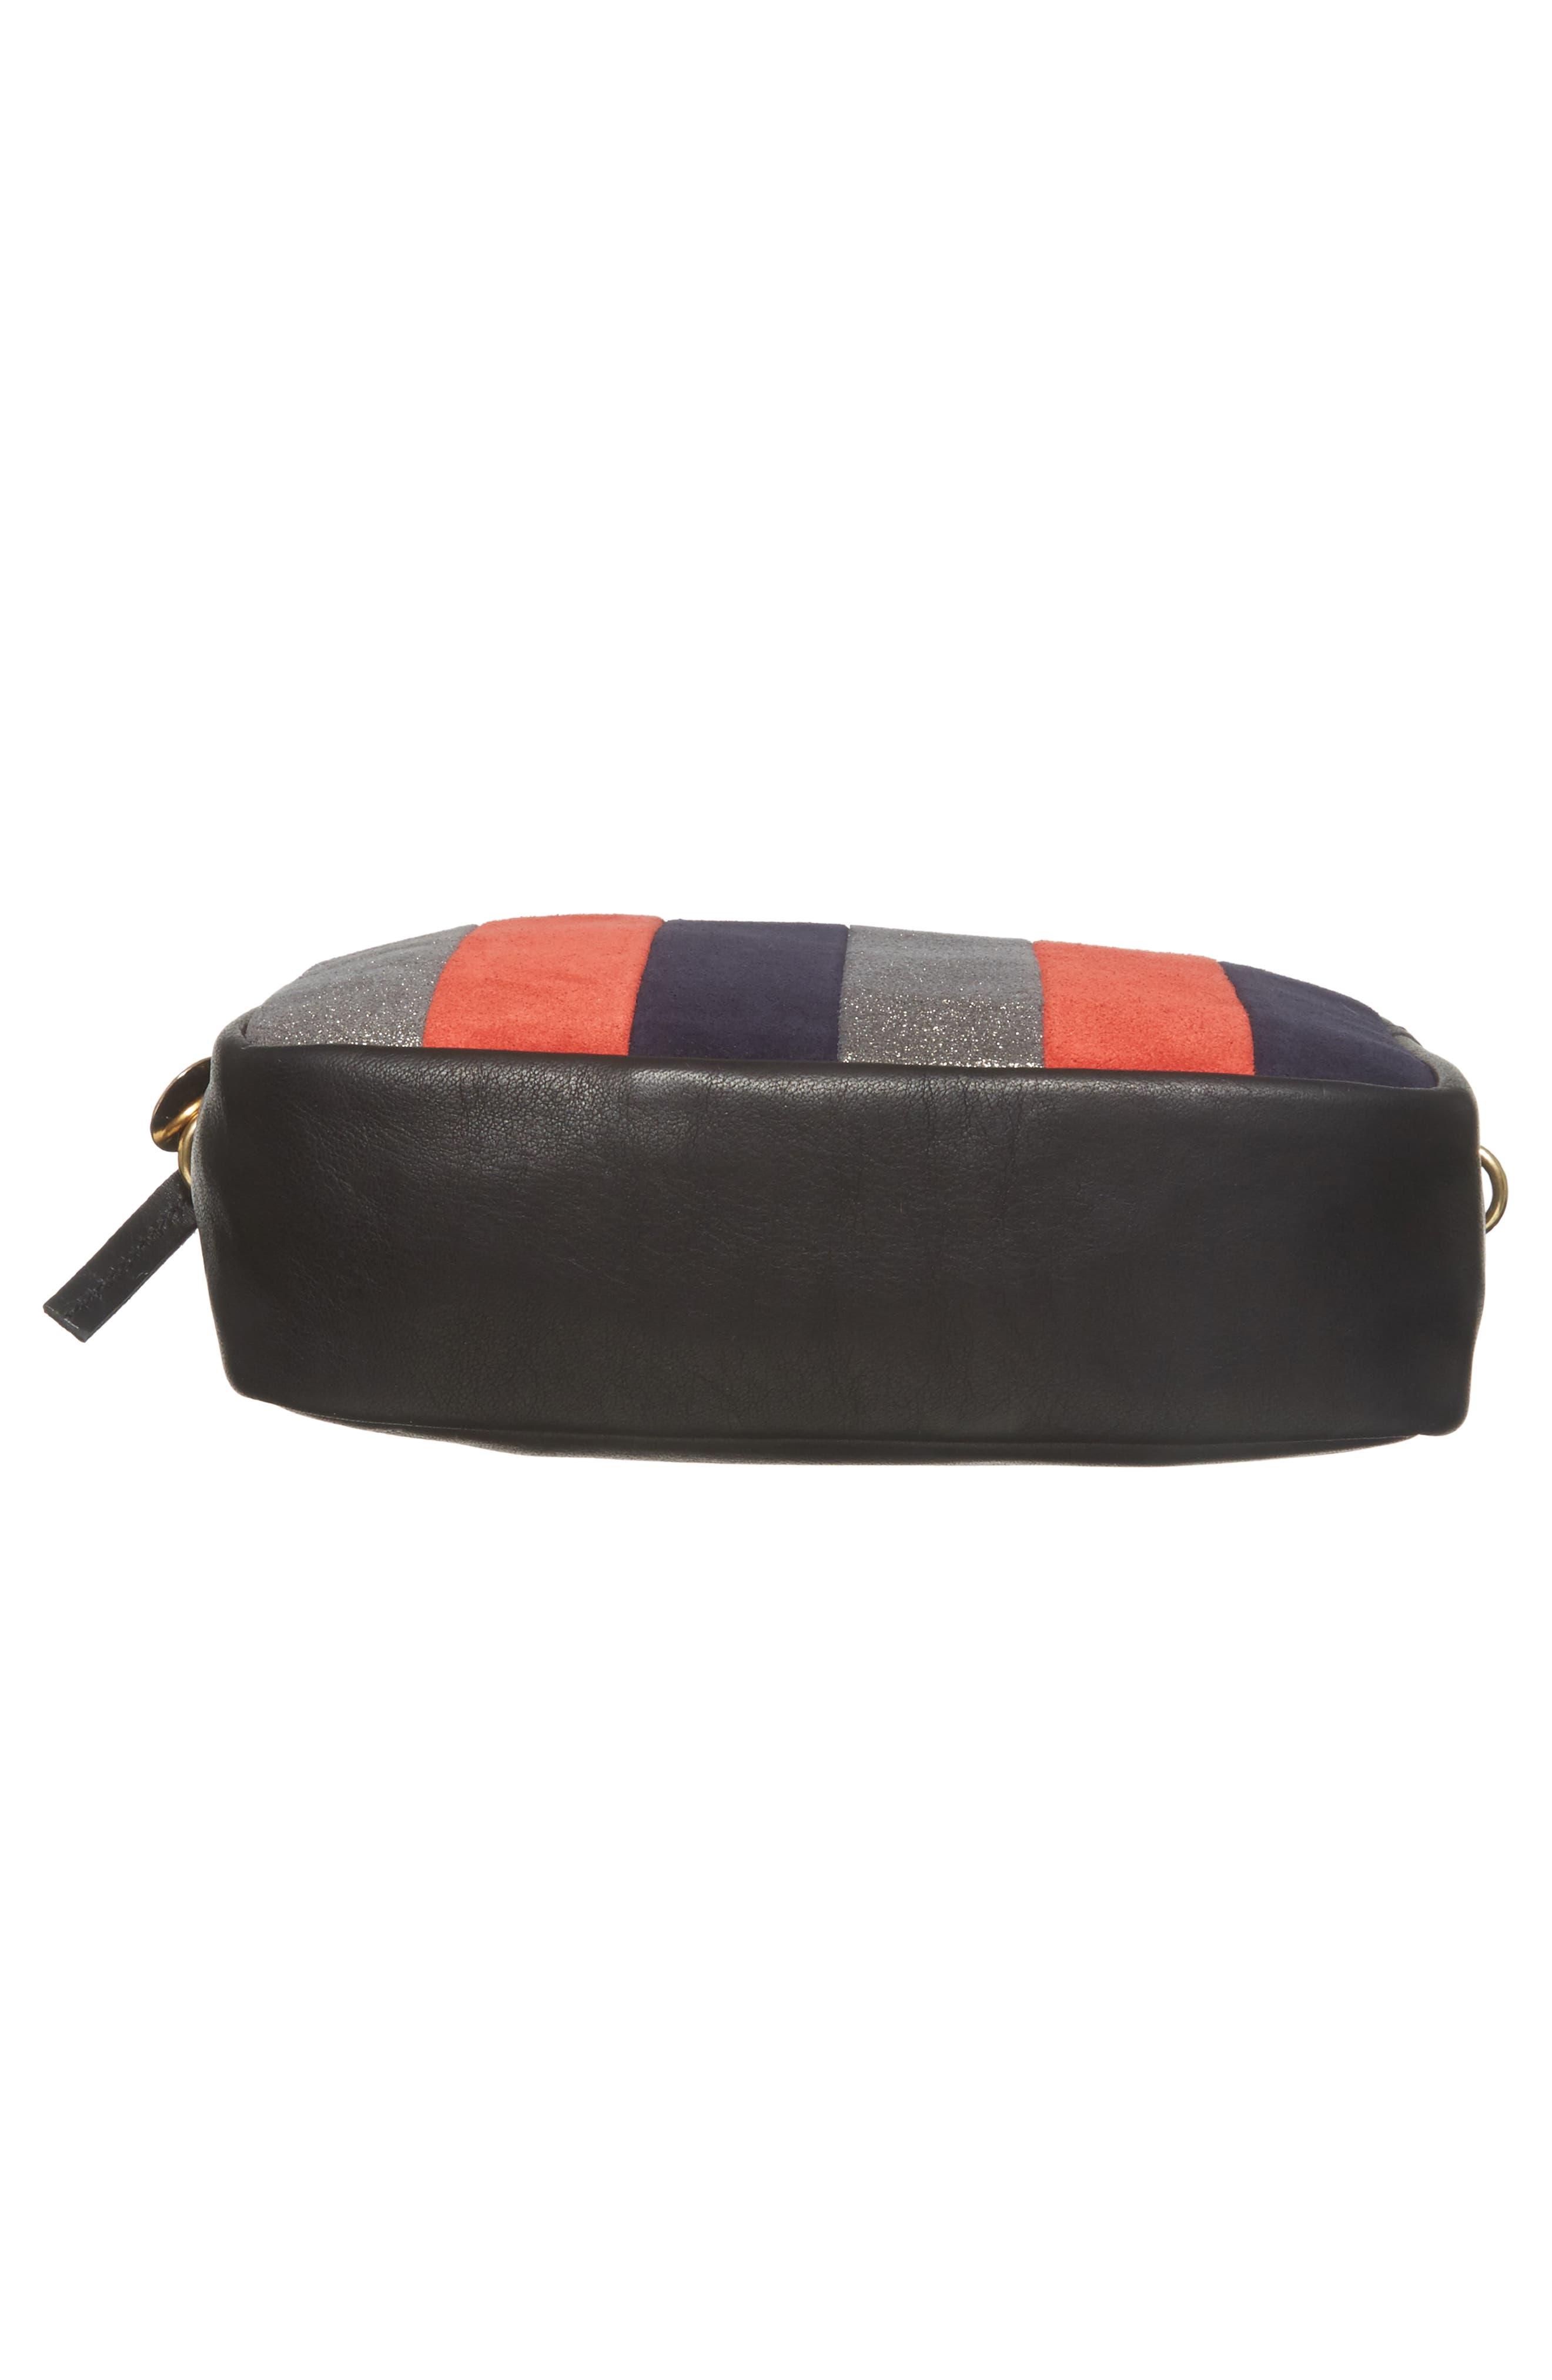 Midi Sac Stripe Leather Crossbody Bag,                             Alternate thumbnail 6, color,                             610